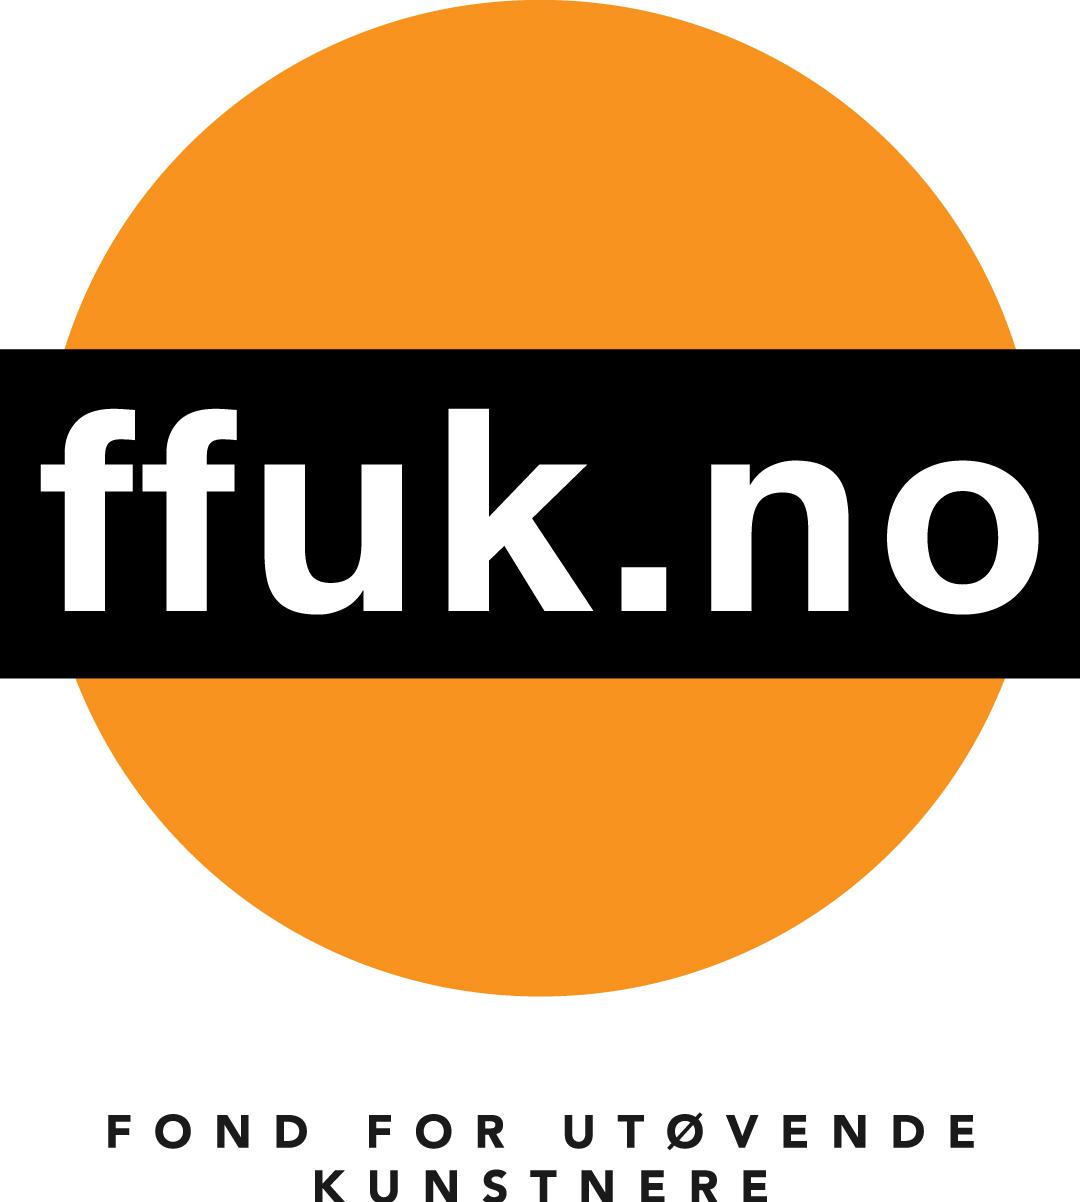 http://www.ffuk.no/getfile.php/3616033.1027.ctypdapccf/Ny+FFUK-logo-jpg.jpg